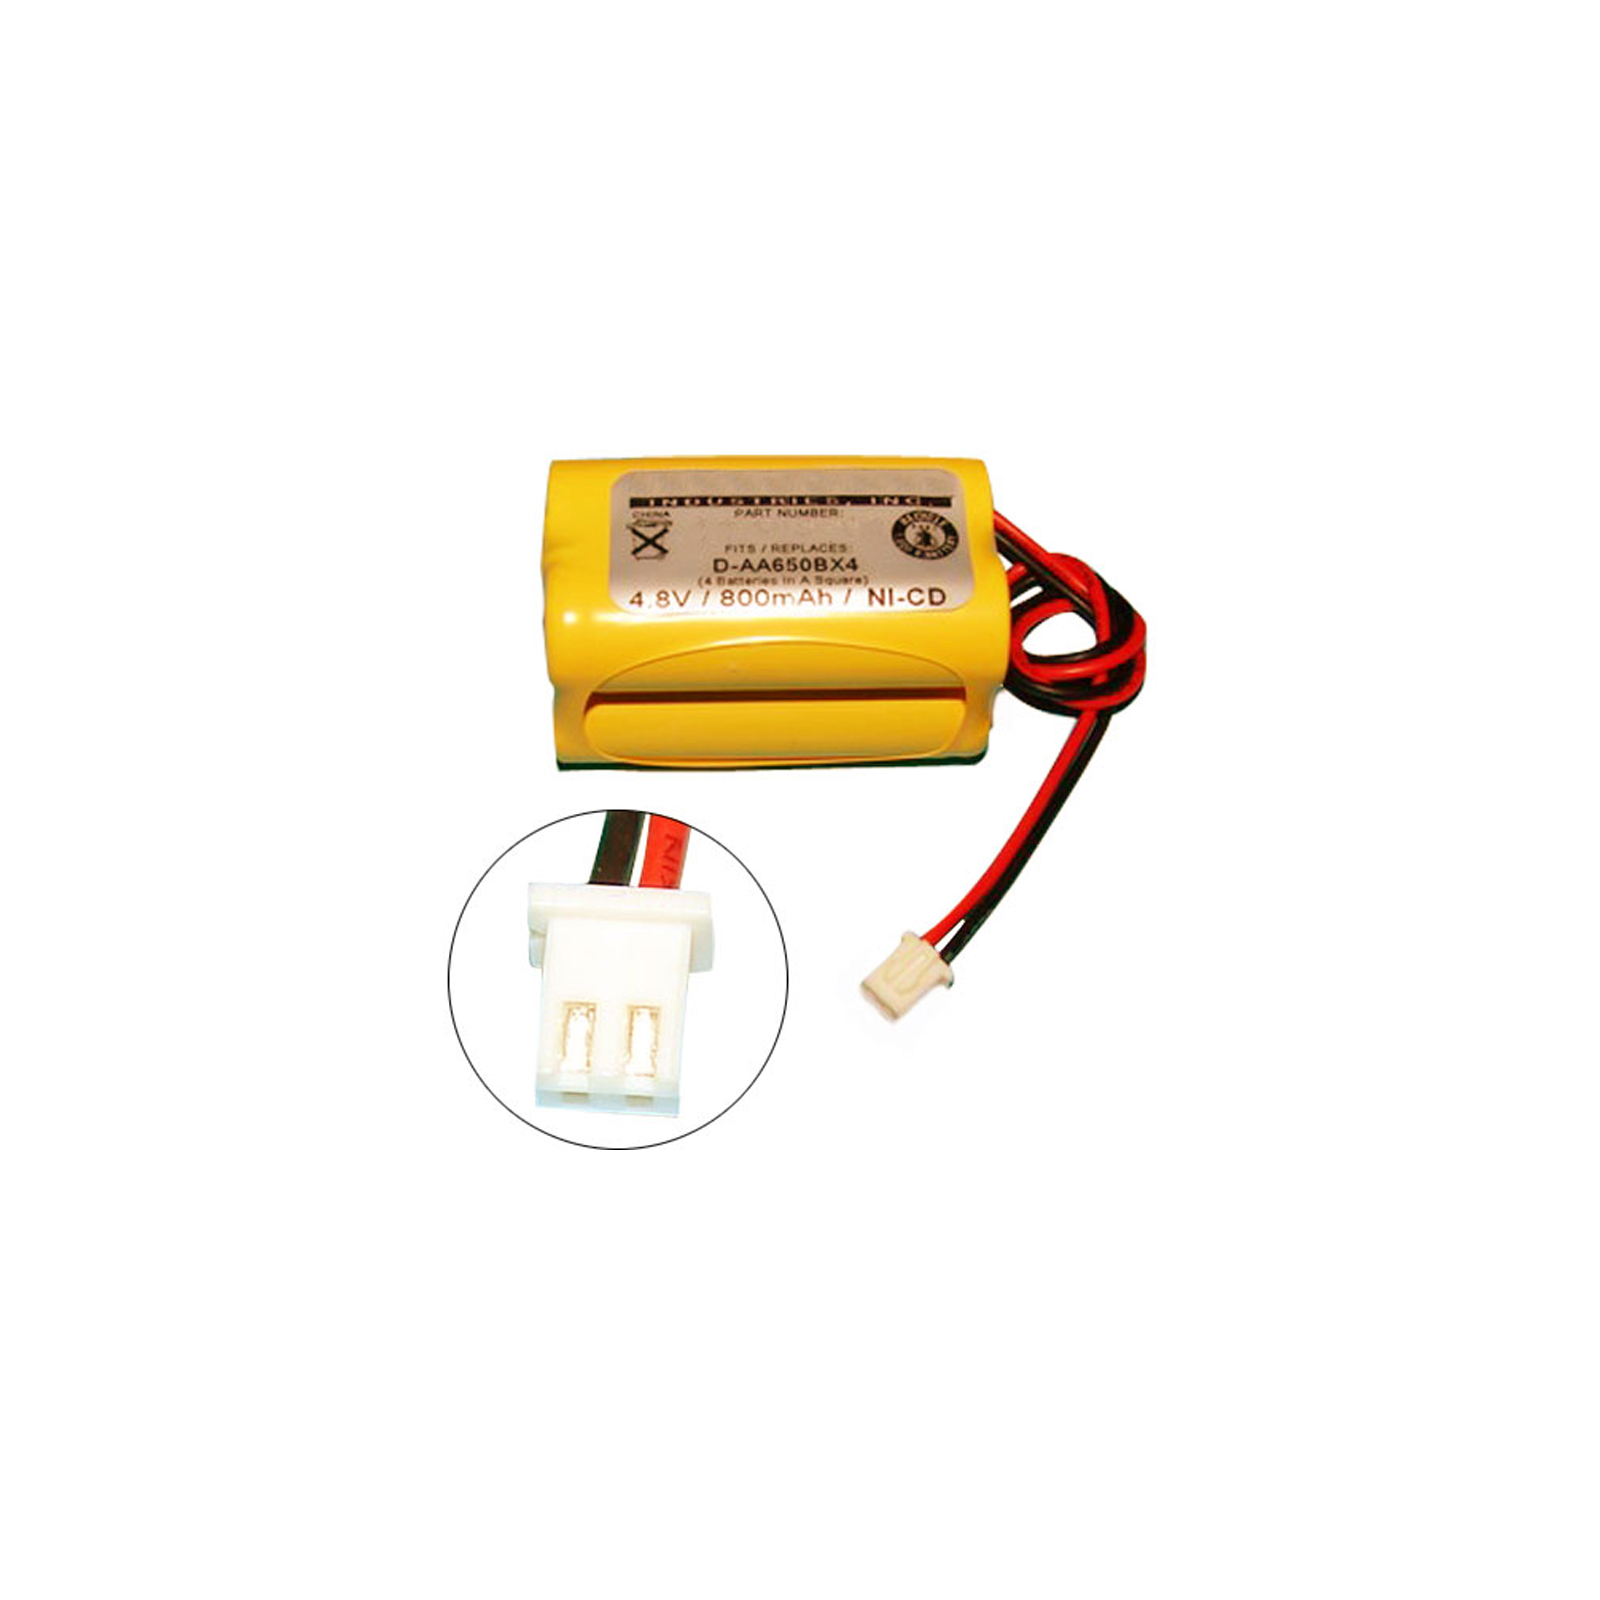 Lithonia Lighting Emergency Light Battery: Emergency Lighting Exit Sign Battery For Lithonia D